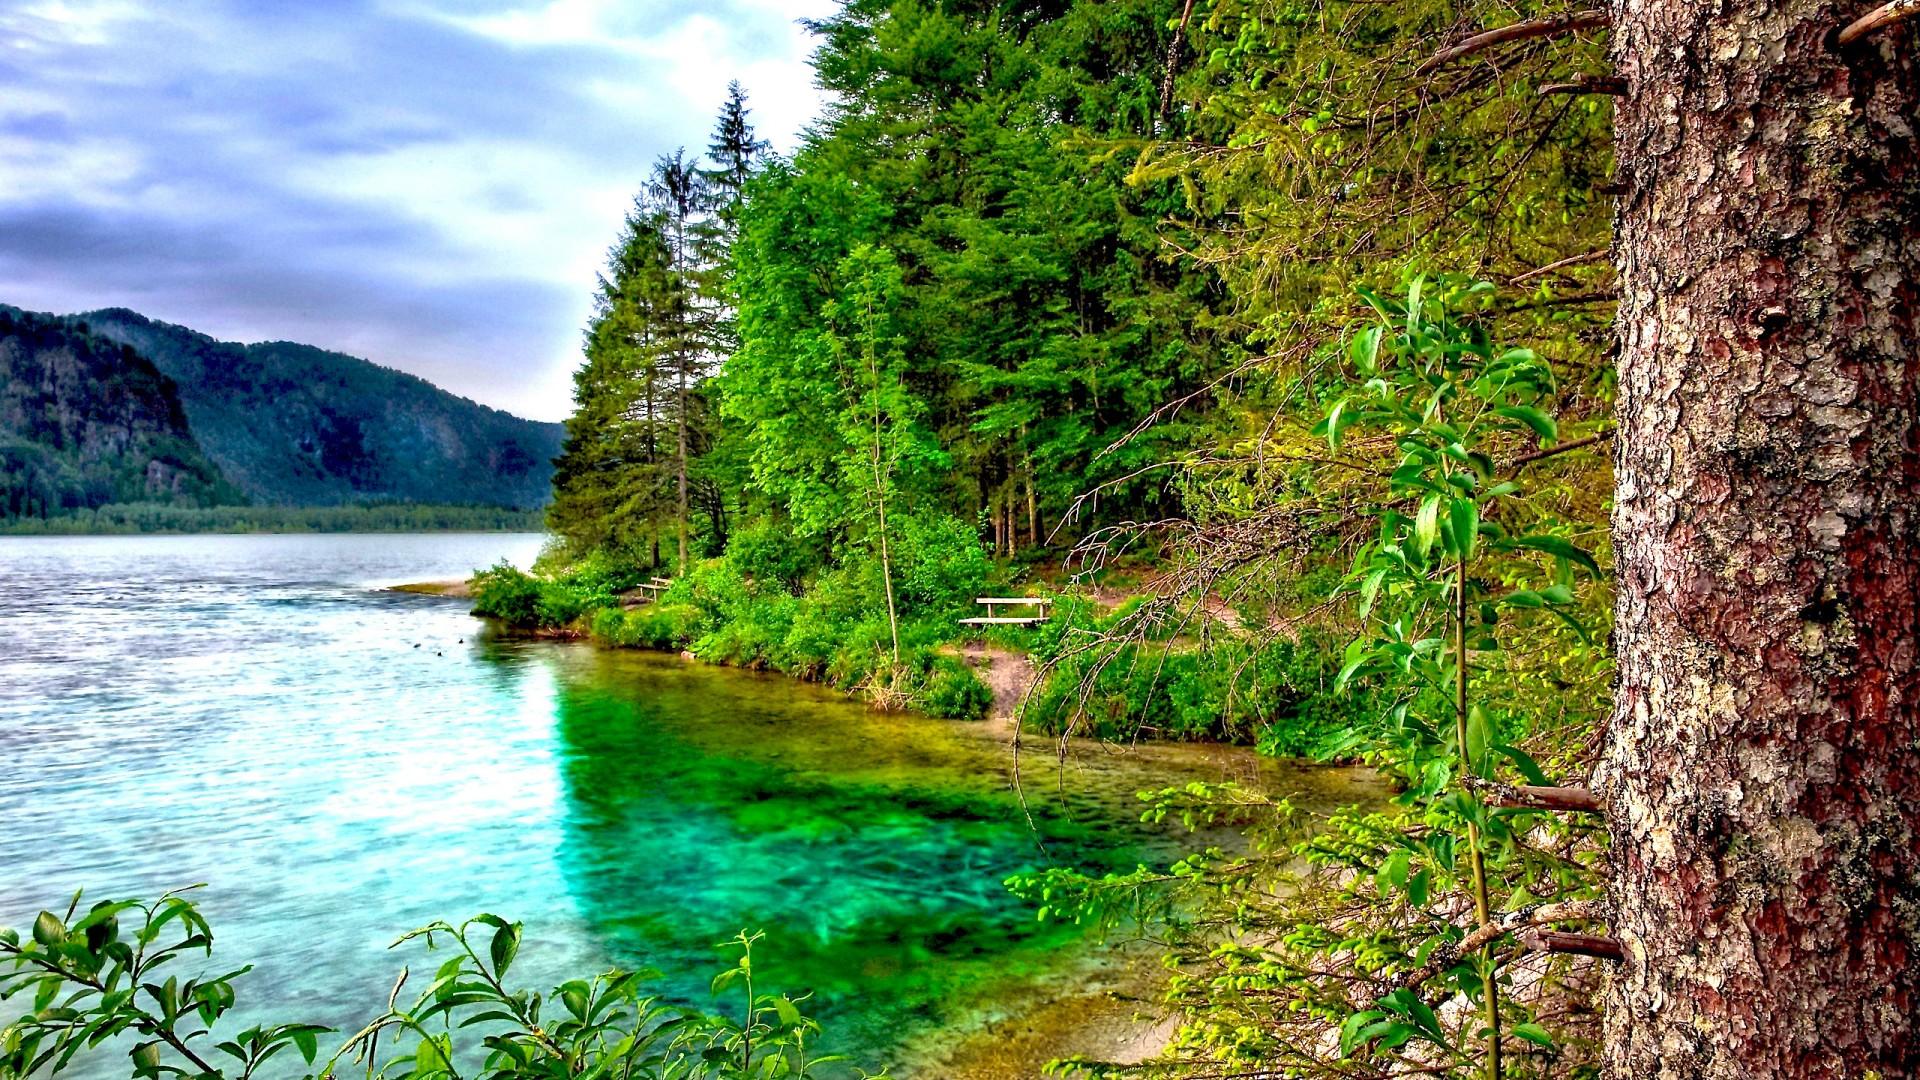 forest desktop wallpaper,natural landscape,nature,body of water,water,nature reserve